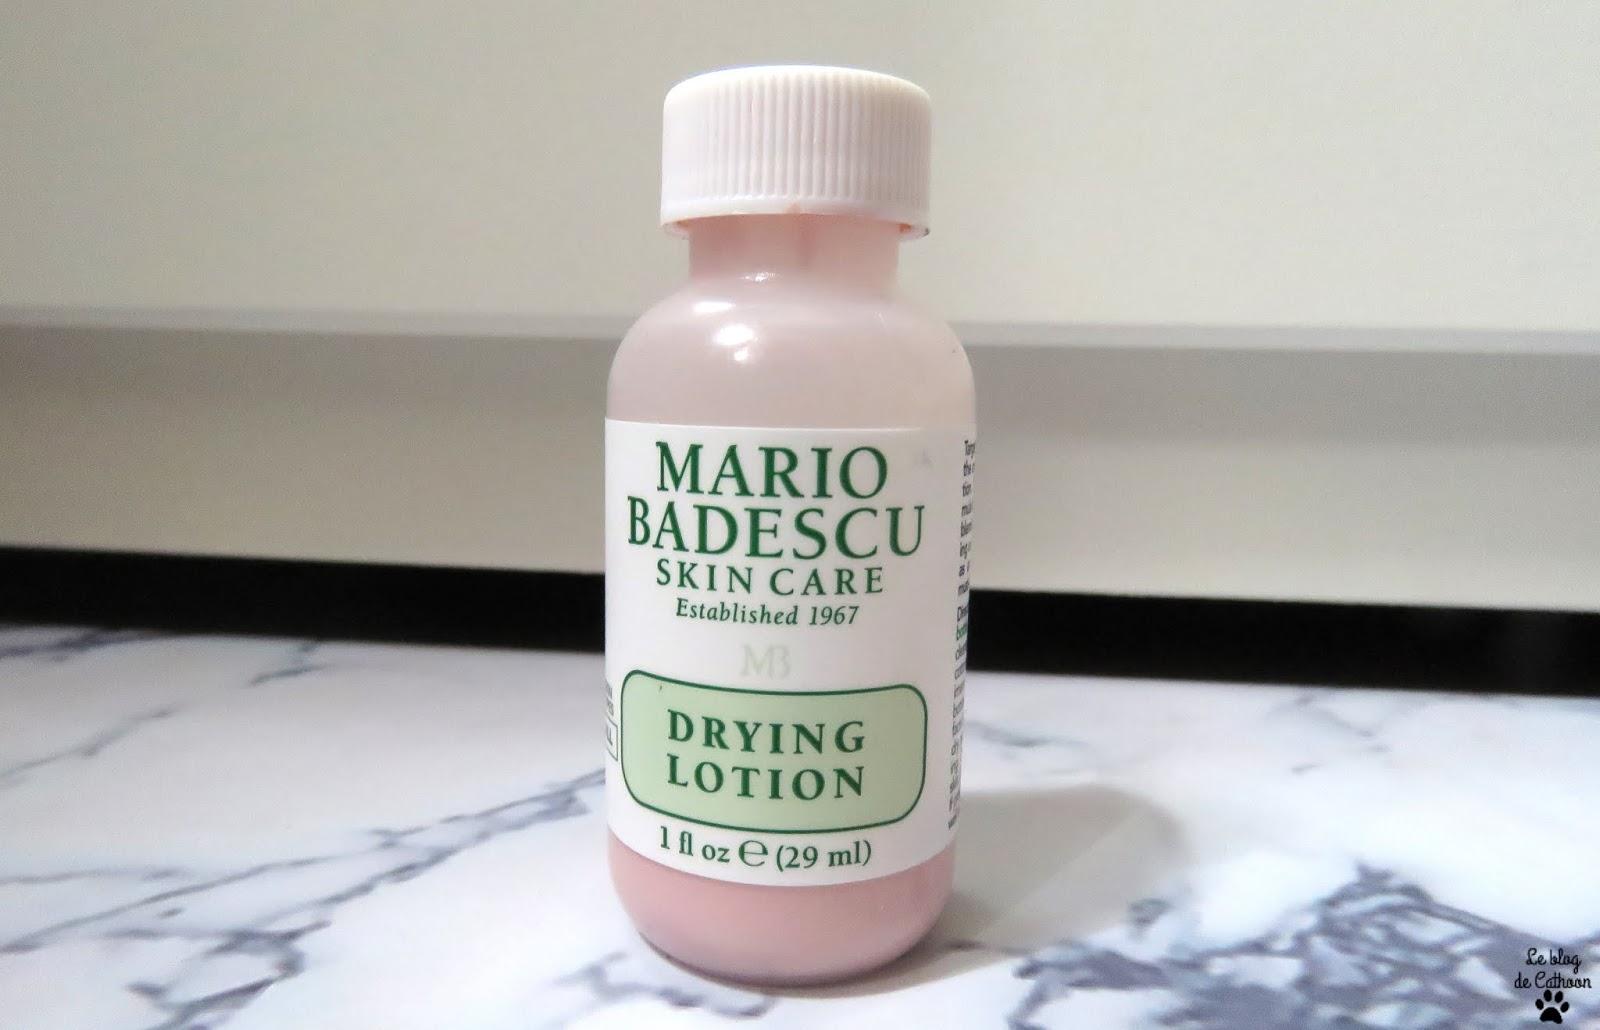 Drying Lotion - Mario Badescu Skin Care - Mario Badescu